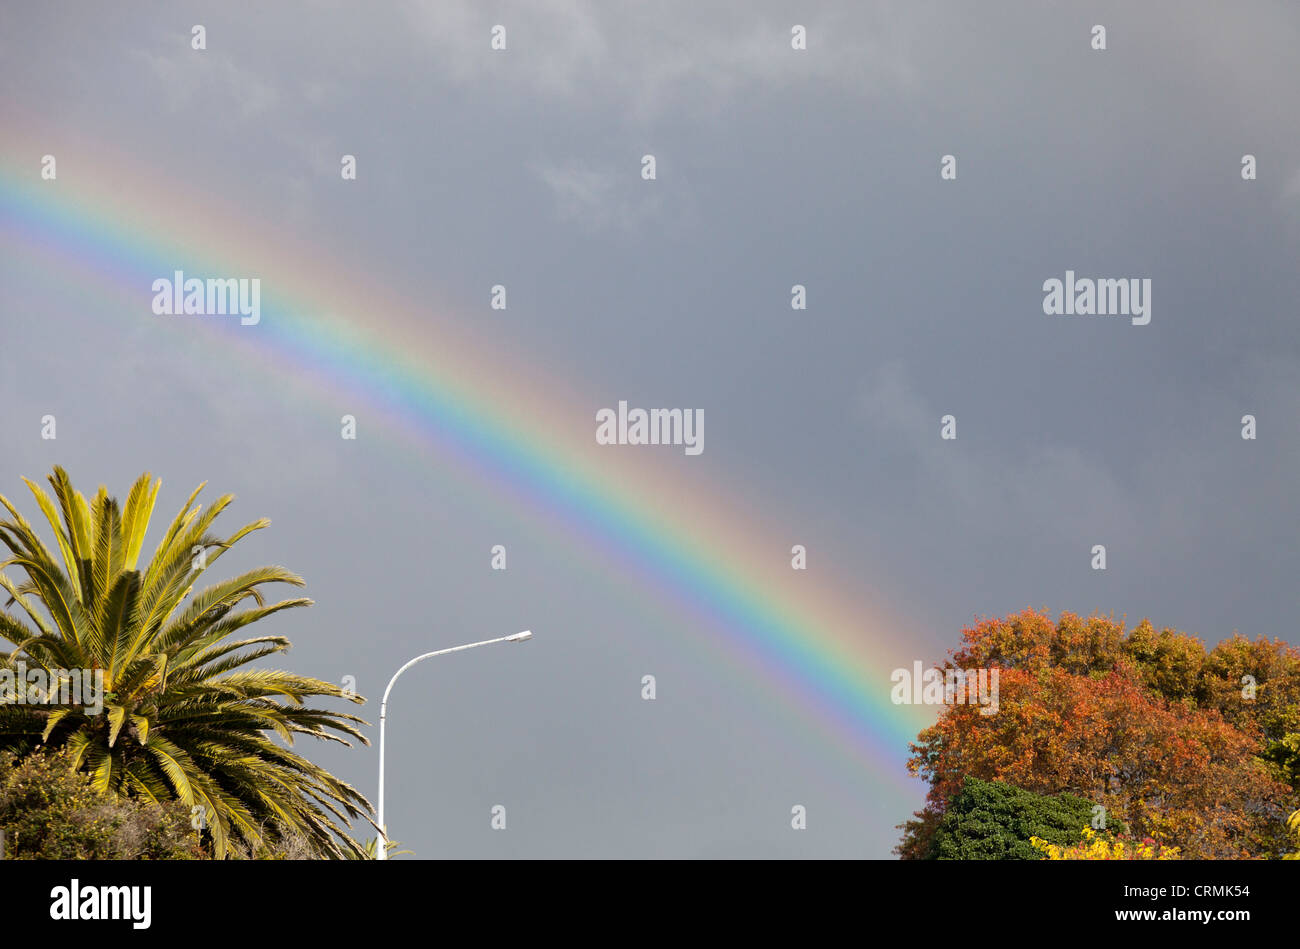 Rainbow over Central Otago, New Zealand - Stock Image